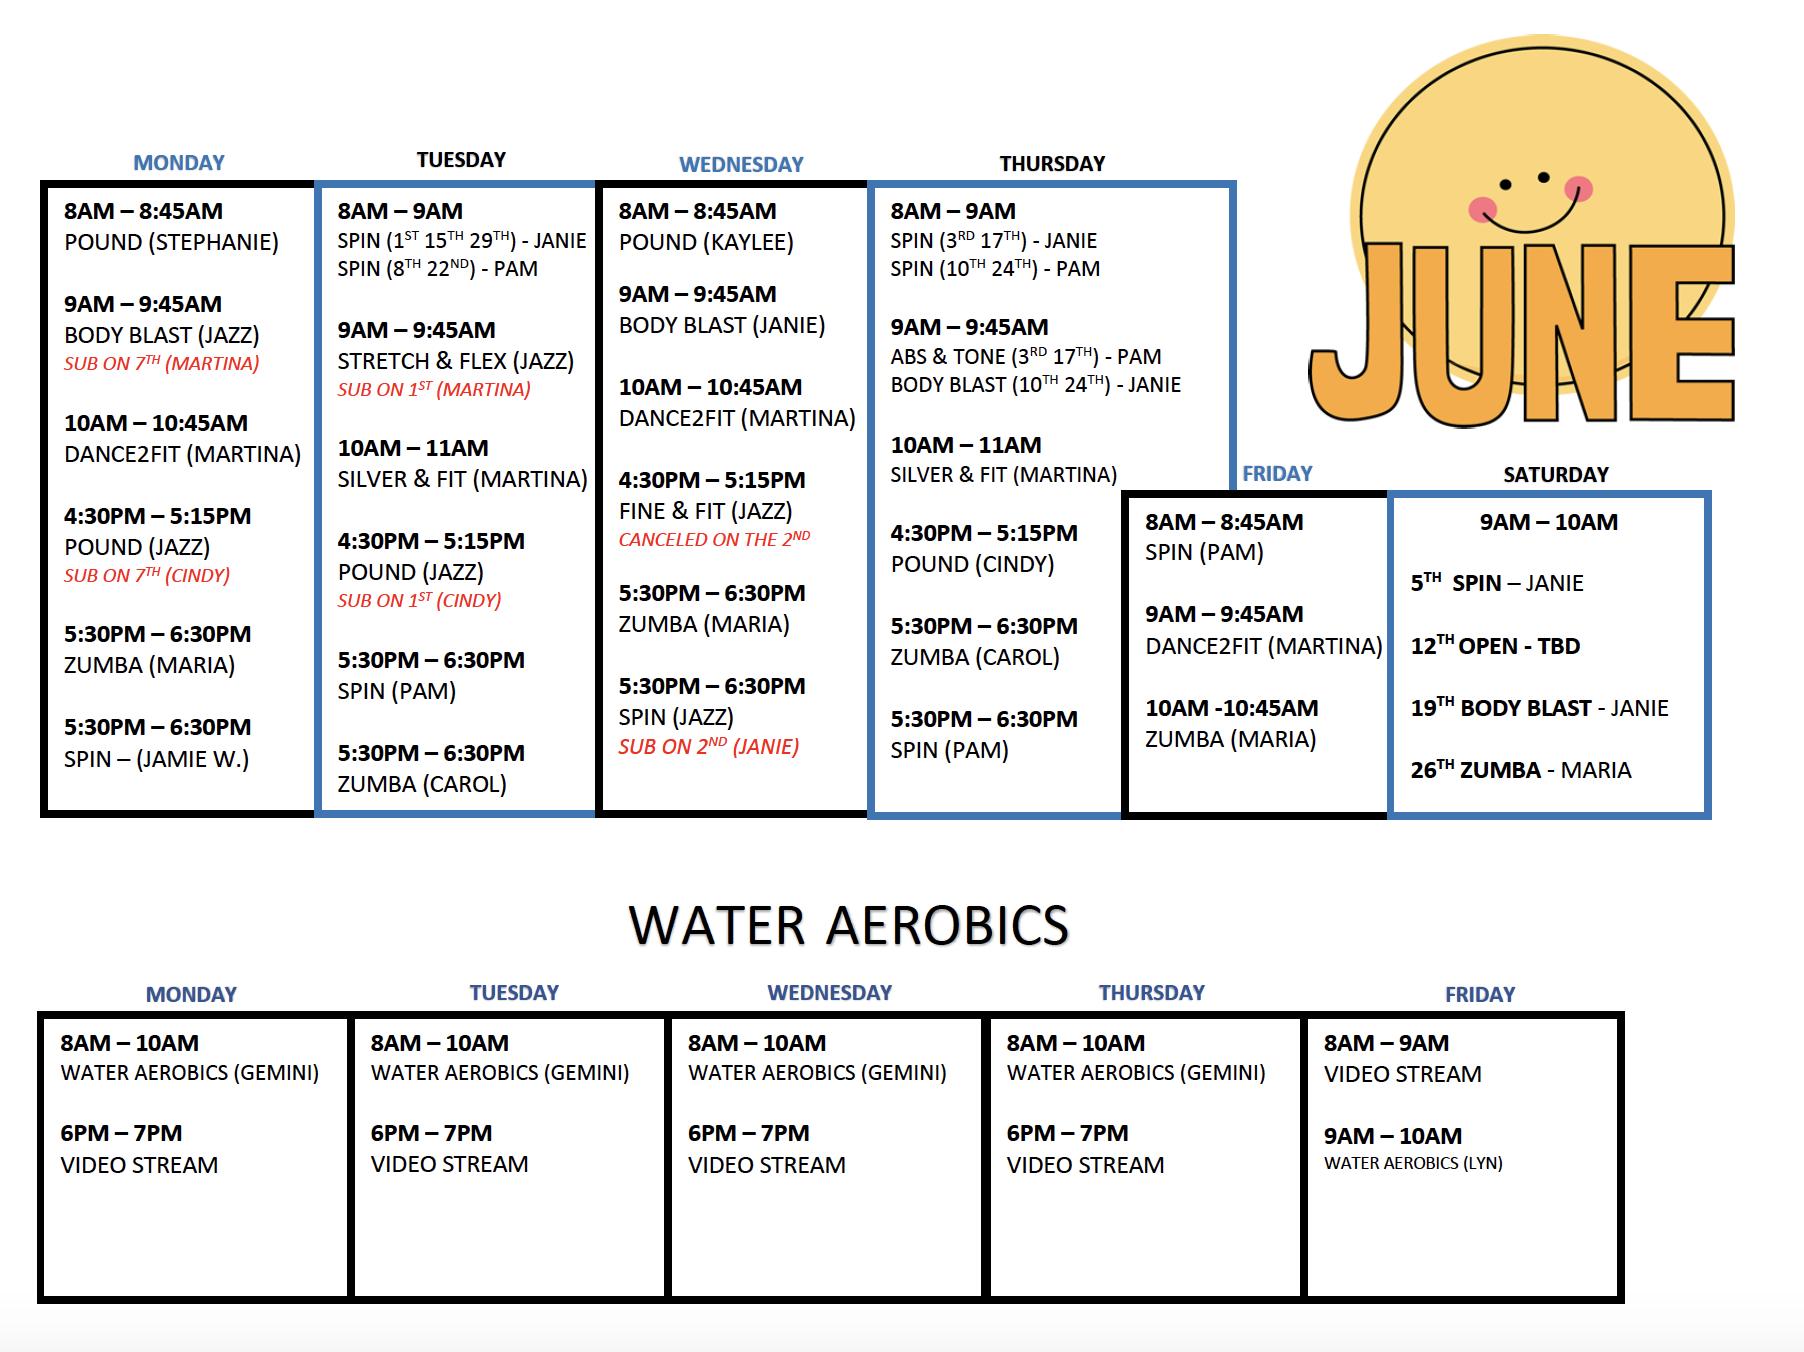 aquatic center | June 2021